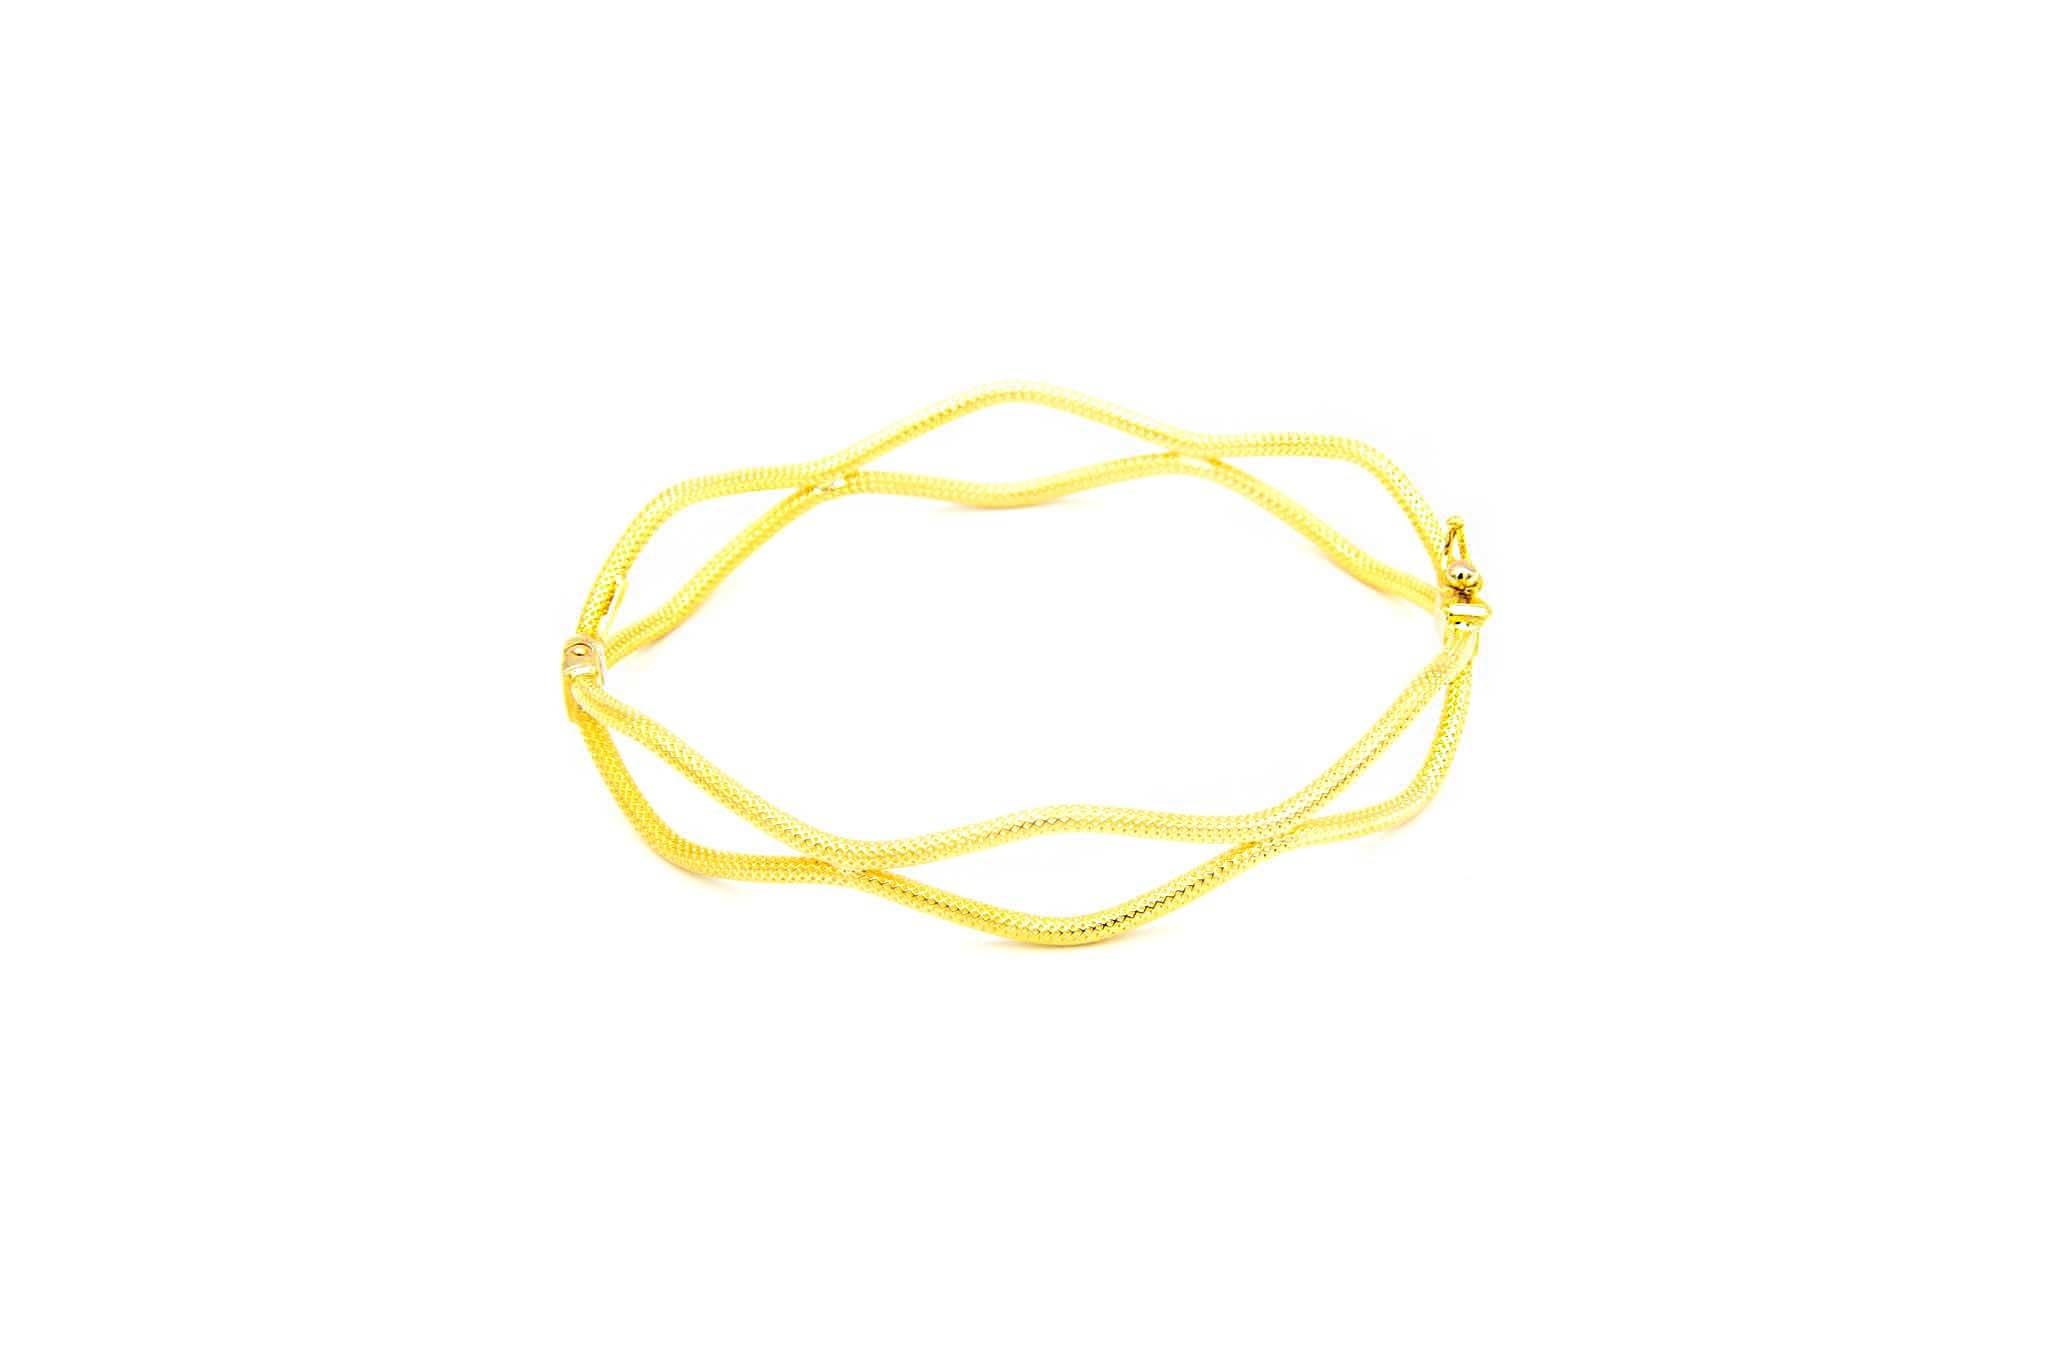 Armband vaste bewerkte dubbele gegolfde band-1